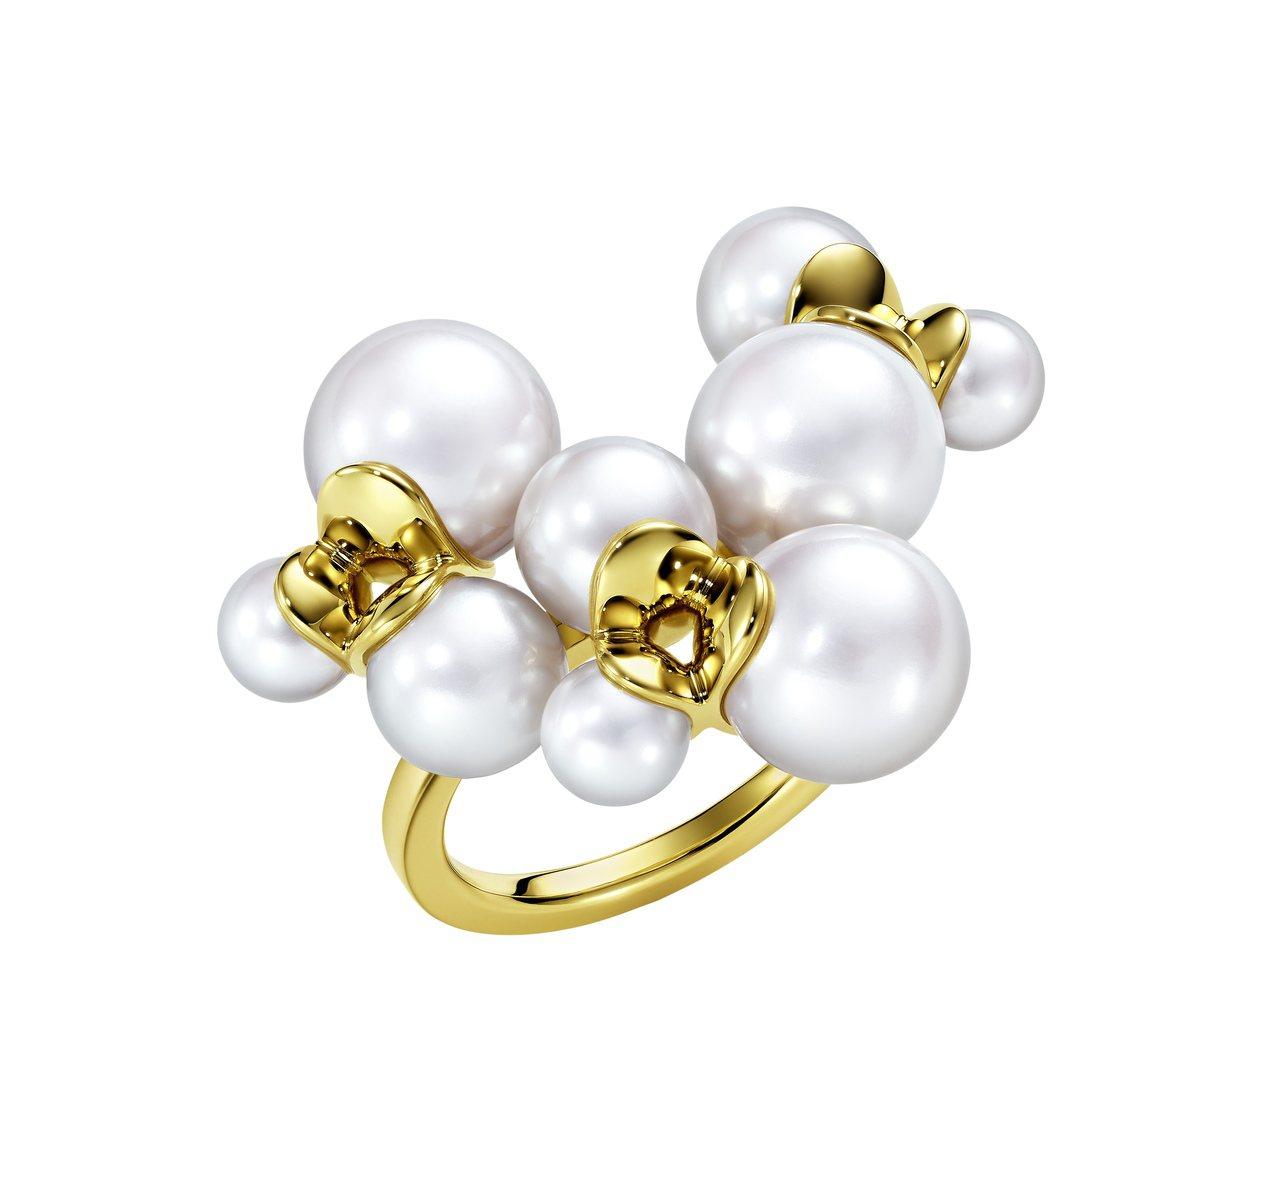 TASAKI M/G系列Illusion珍珠黃K金戒指,約13萬3,000元。圖...